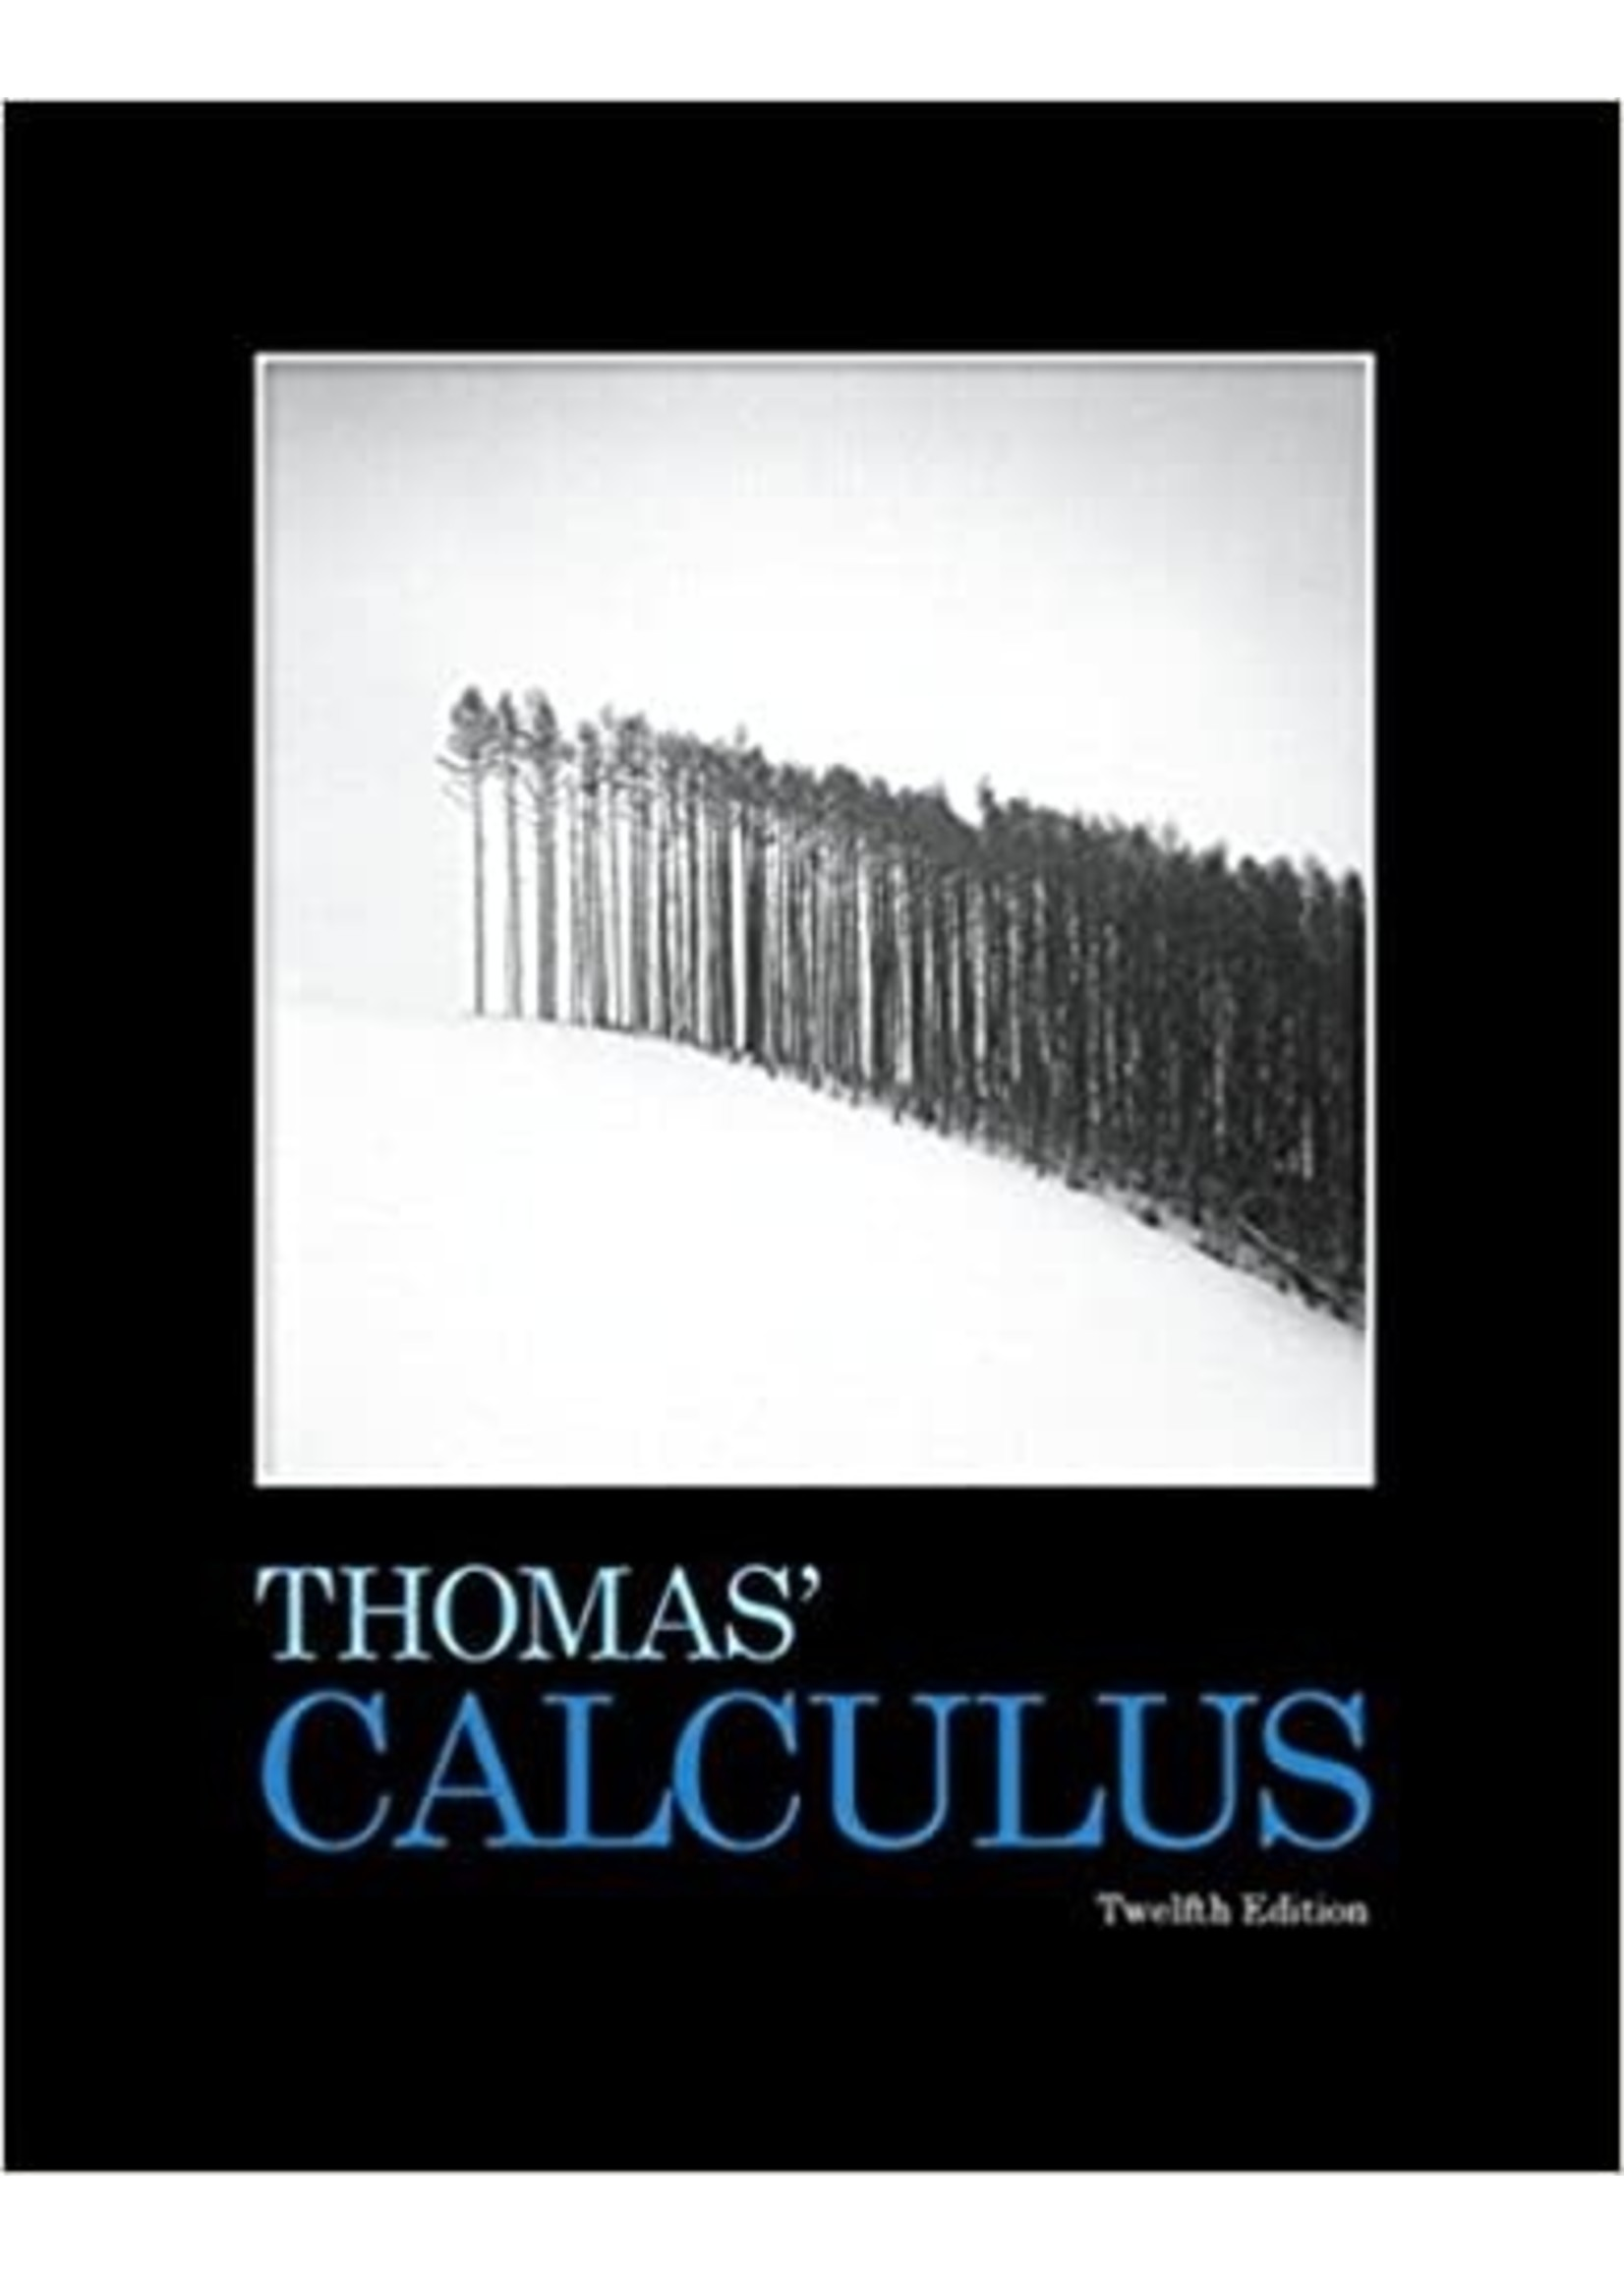 MATH171/172 THOMAS CALCULUS(RENTAL)